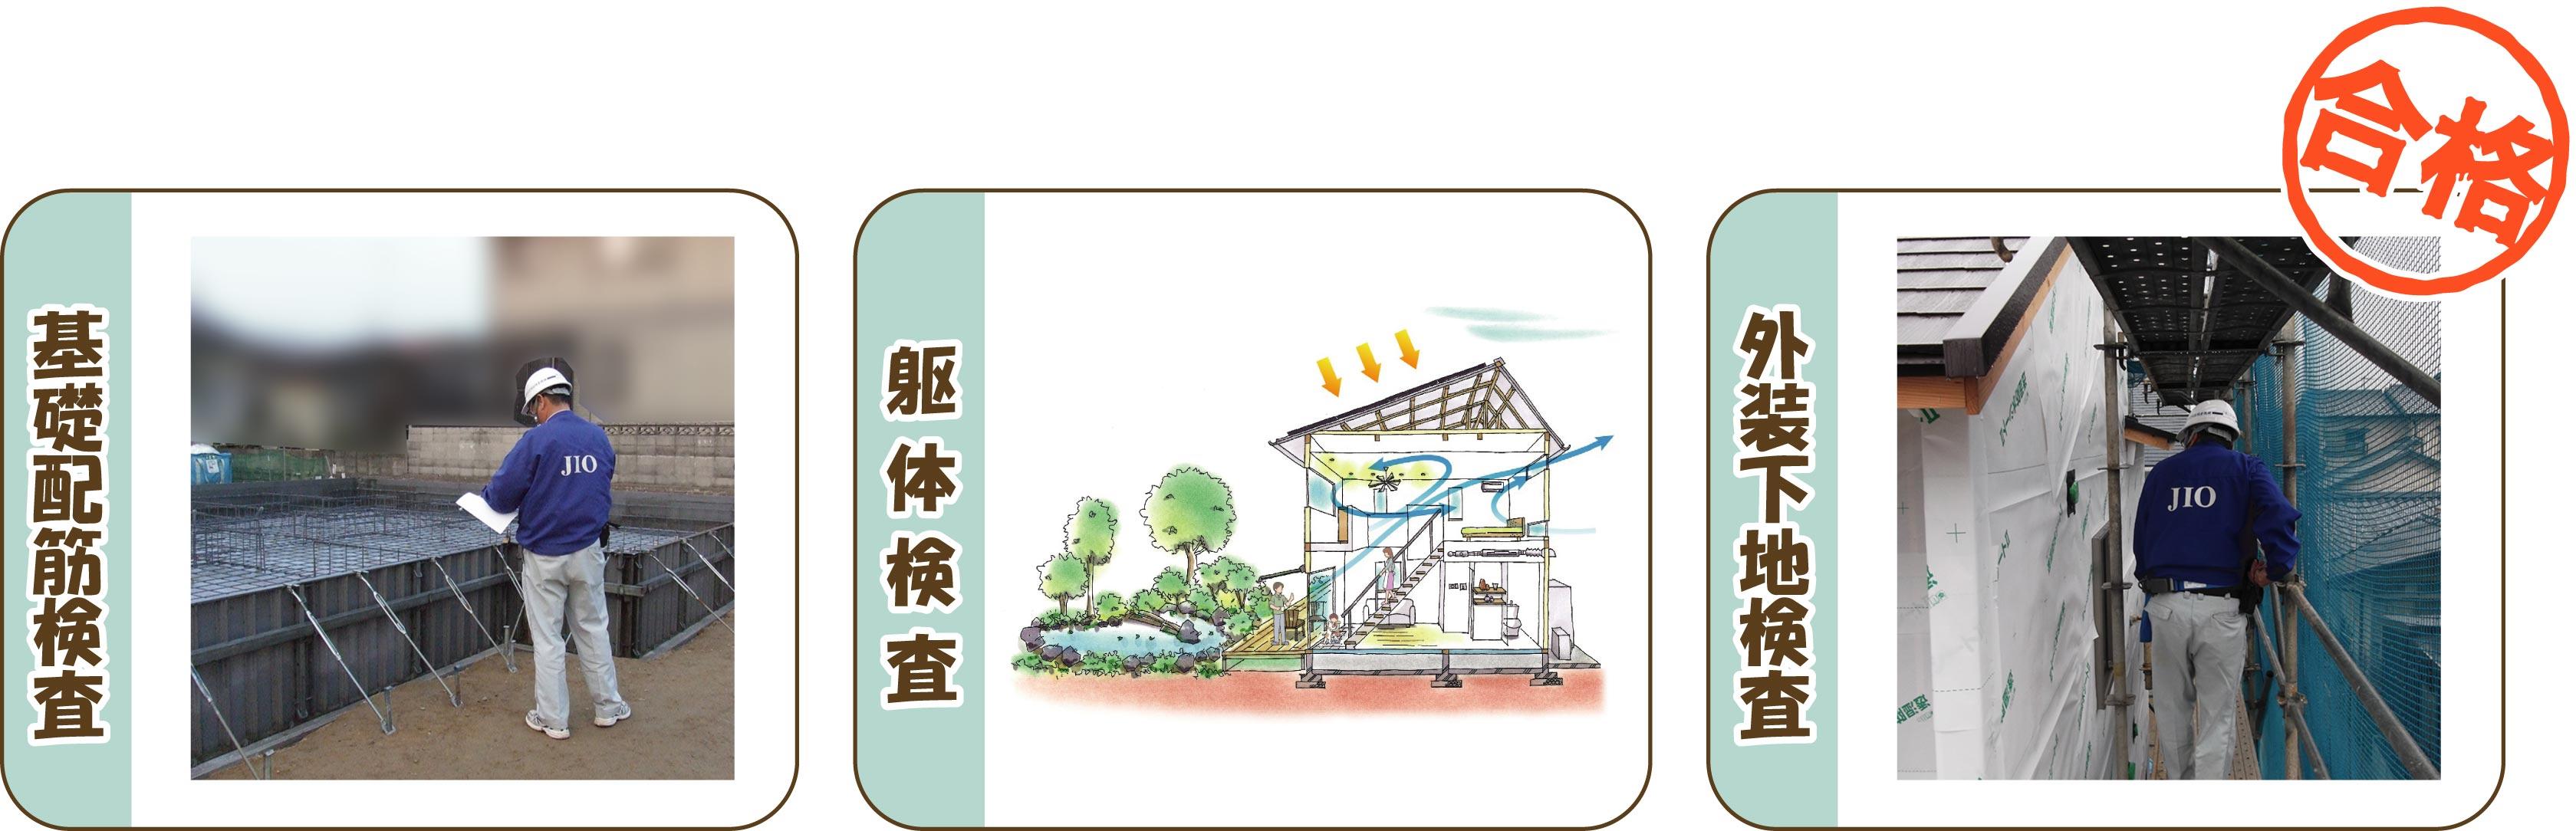 KuraSi-natu-sin80-04.jpg